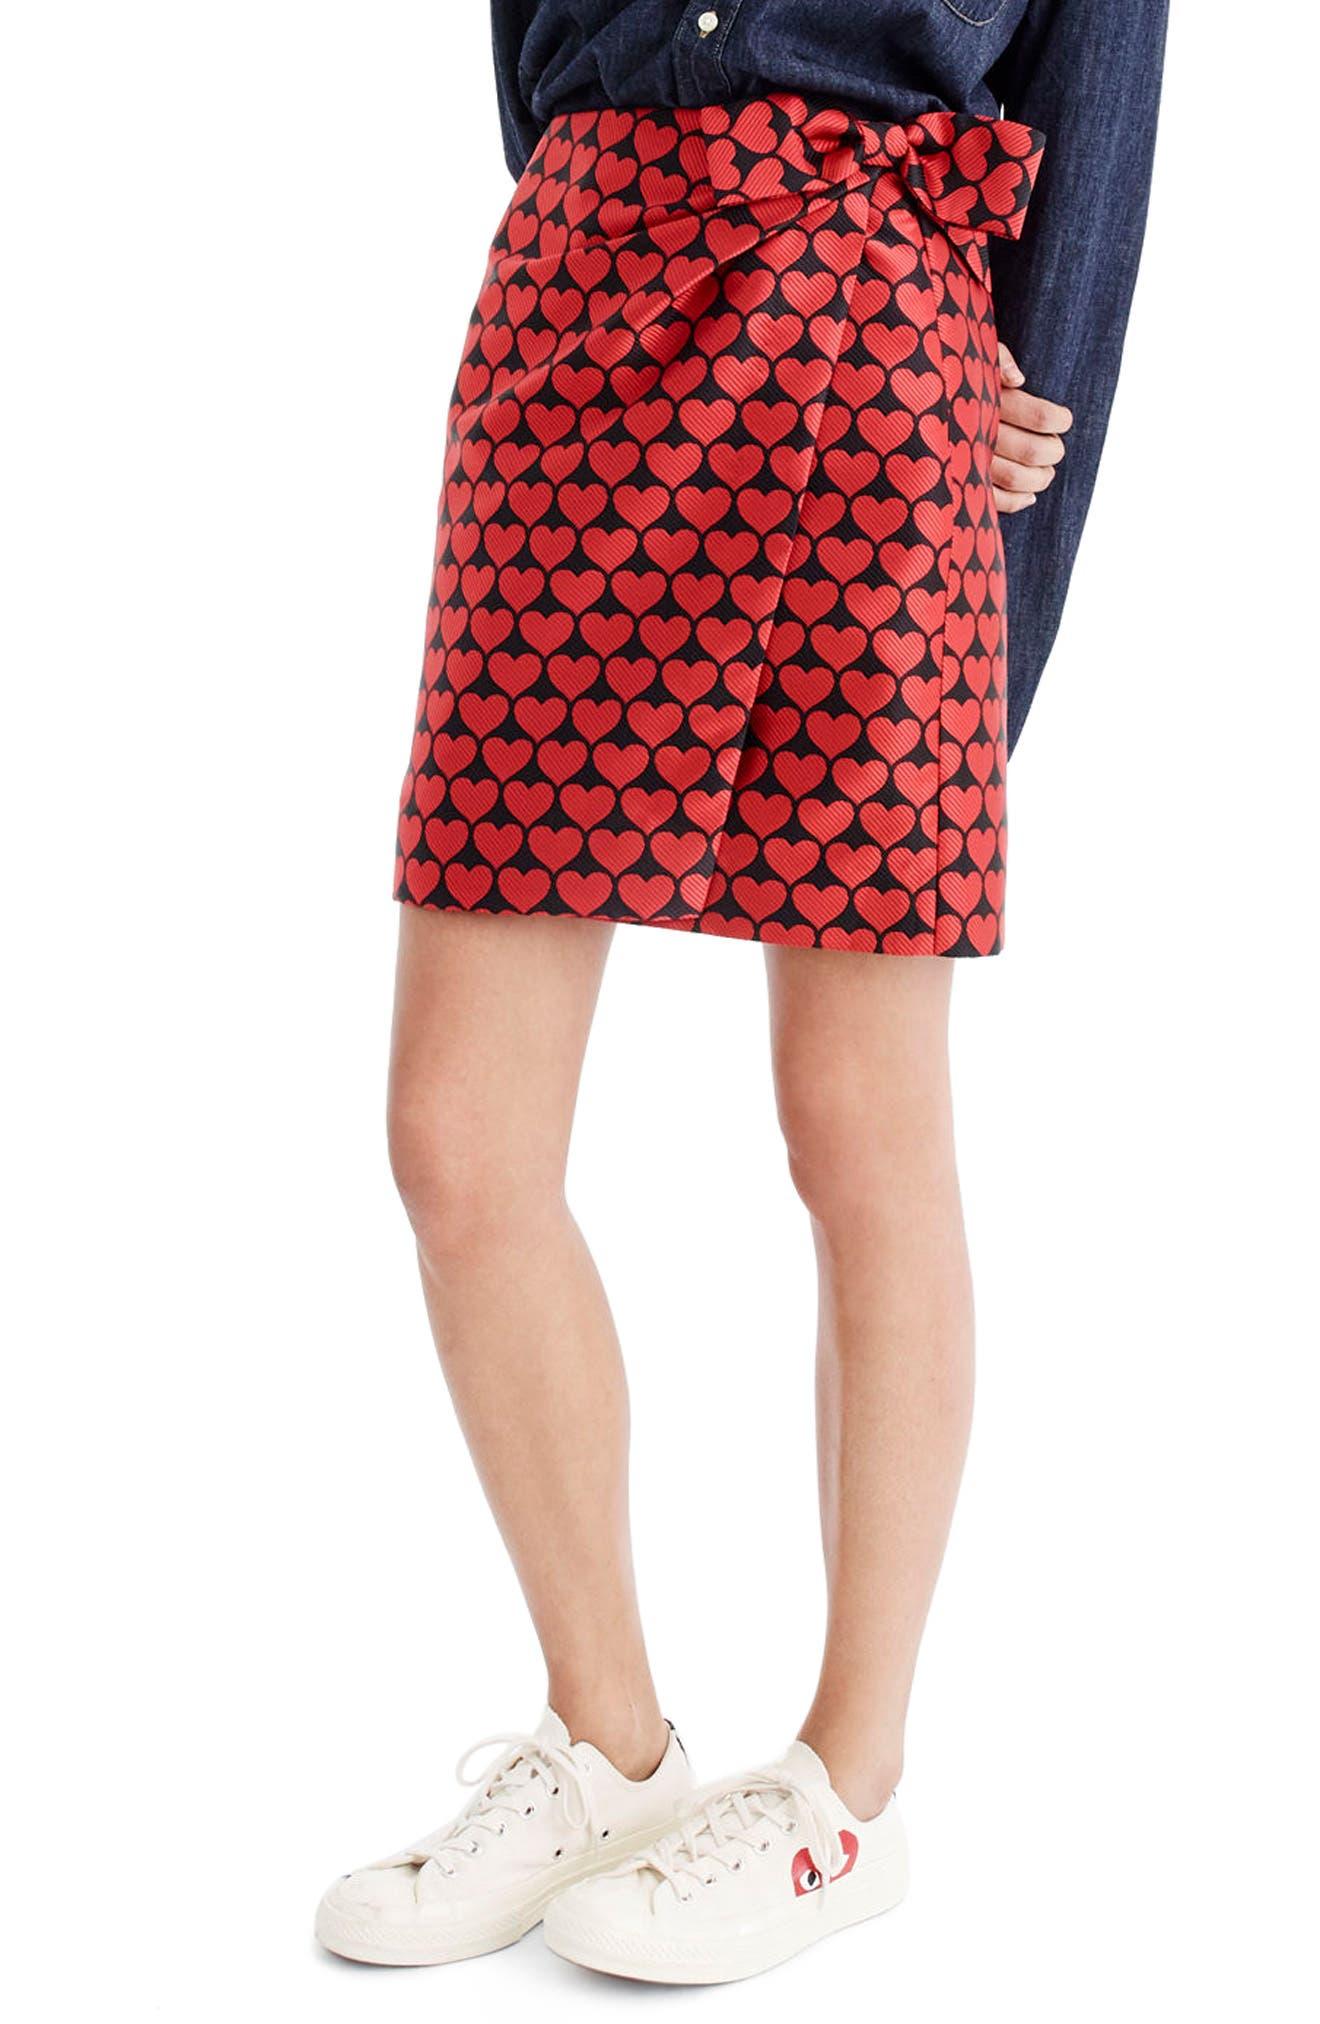 Castlebar Snuggle Heart Skirt,                             Main thumbnail 1, color,                             Electric Red